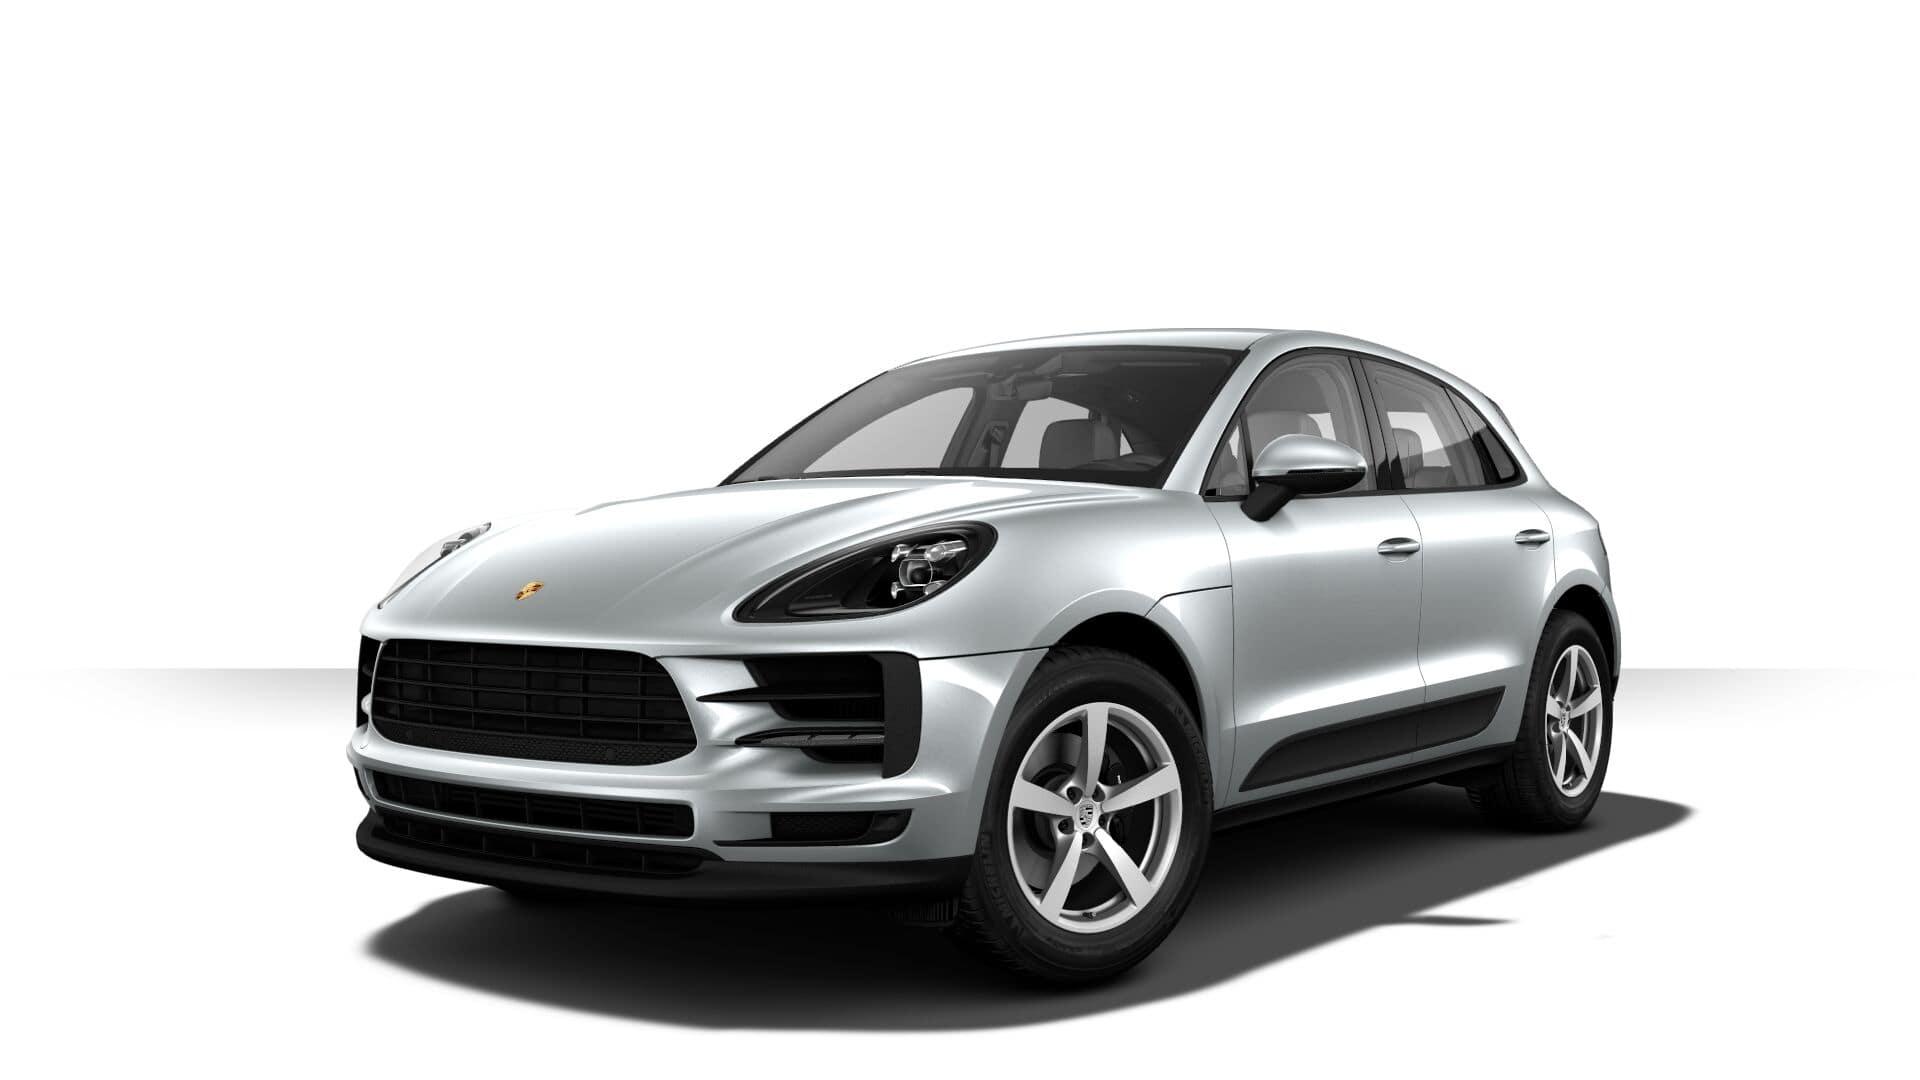 New 2021 Porsche Macan | Porsche Minneapolis